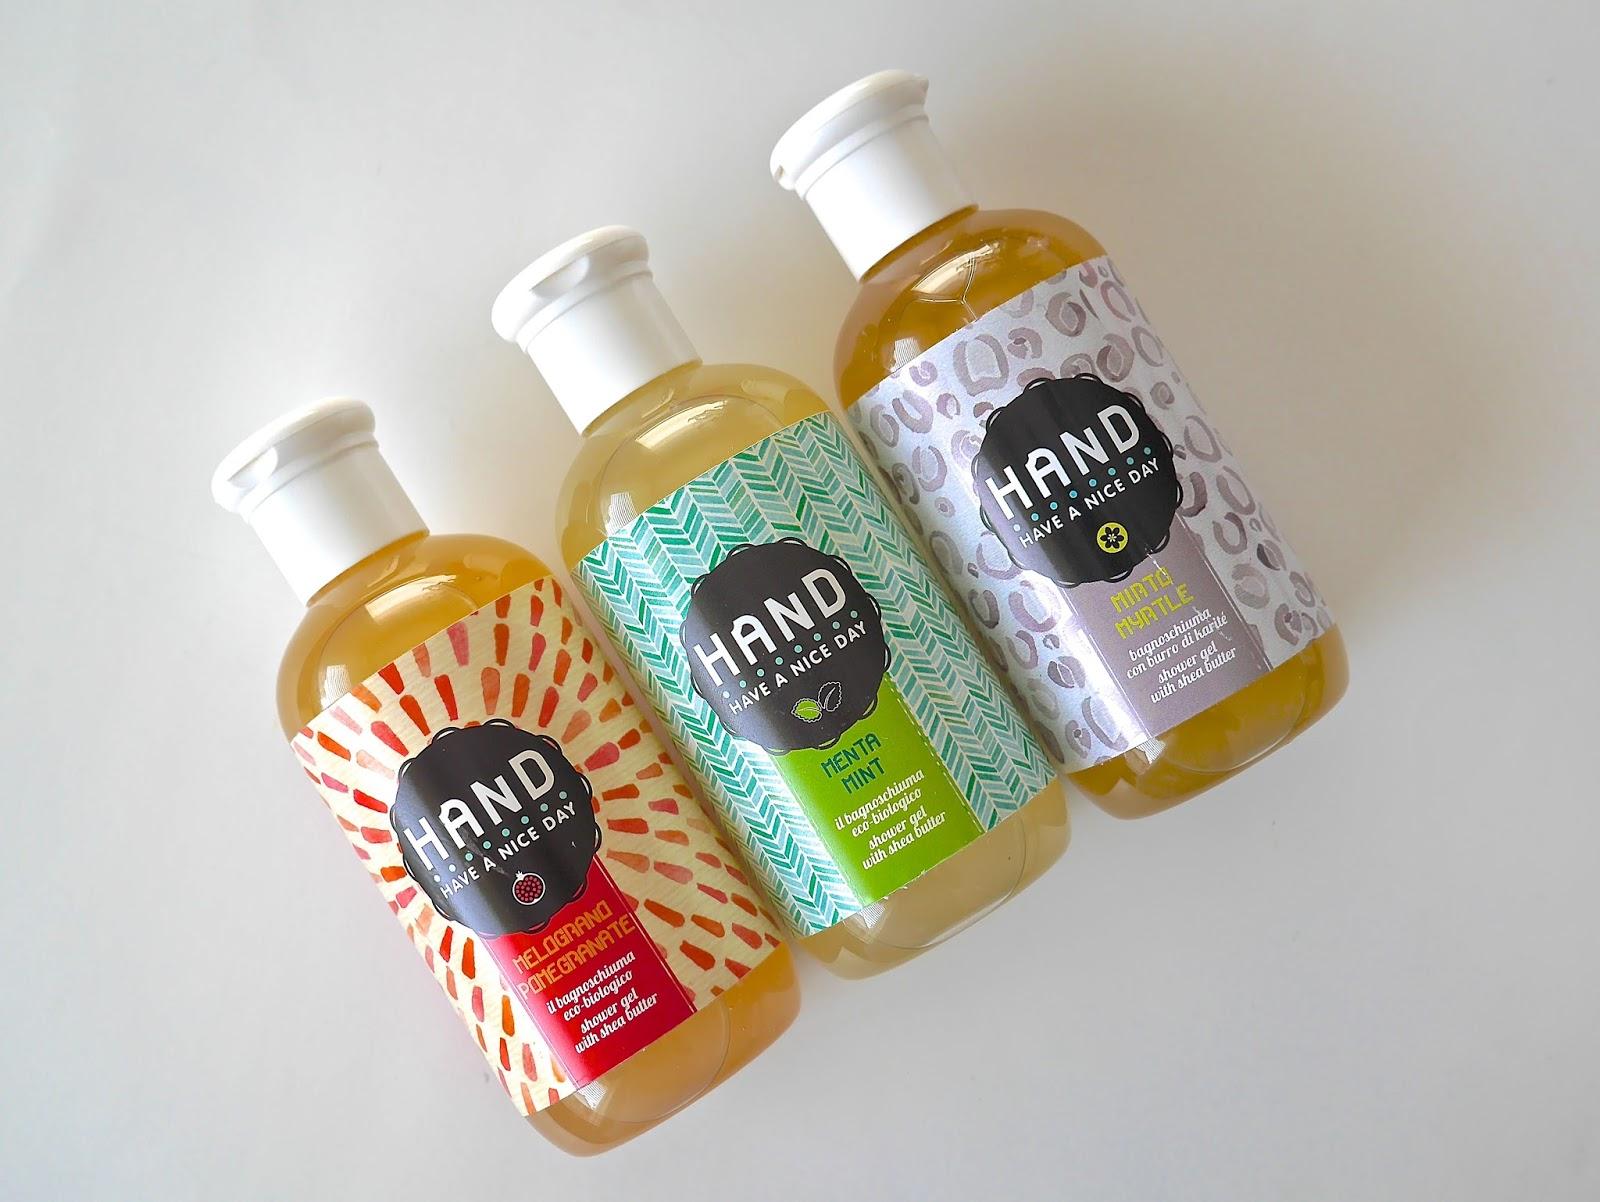 organic, plant based, natural skincare, natural soaps, organic soaps